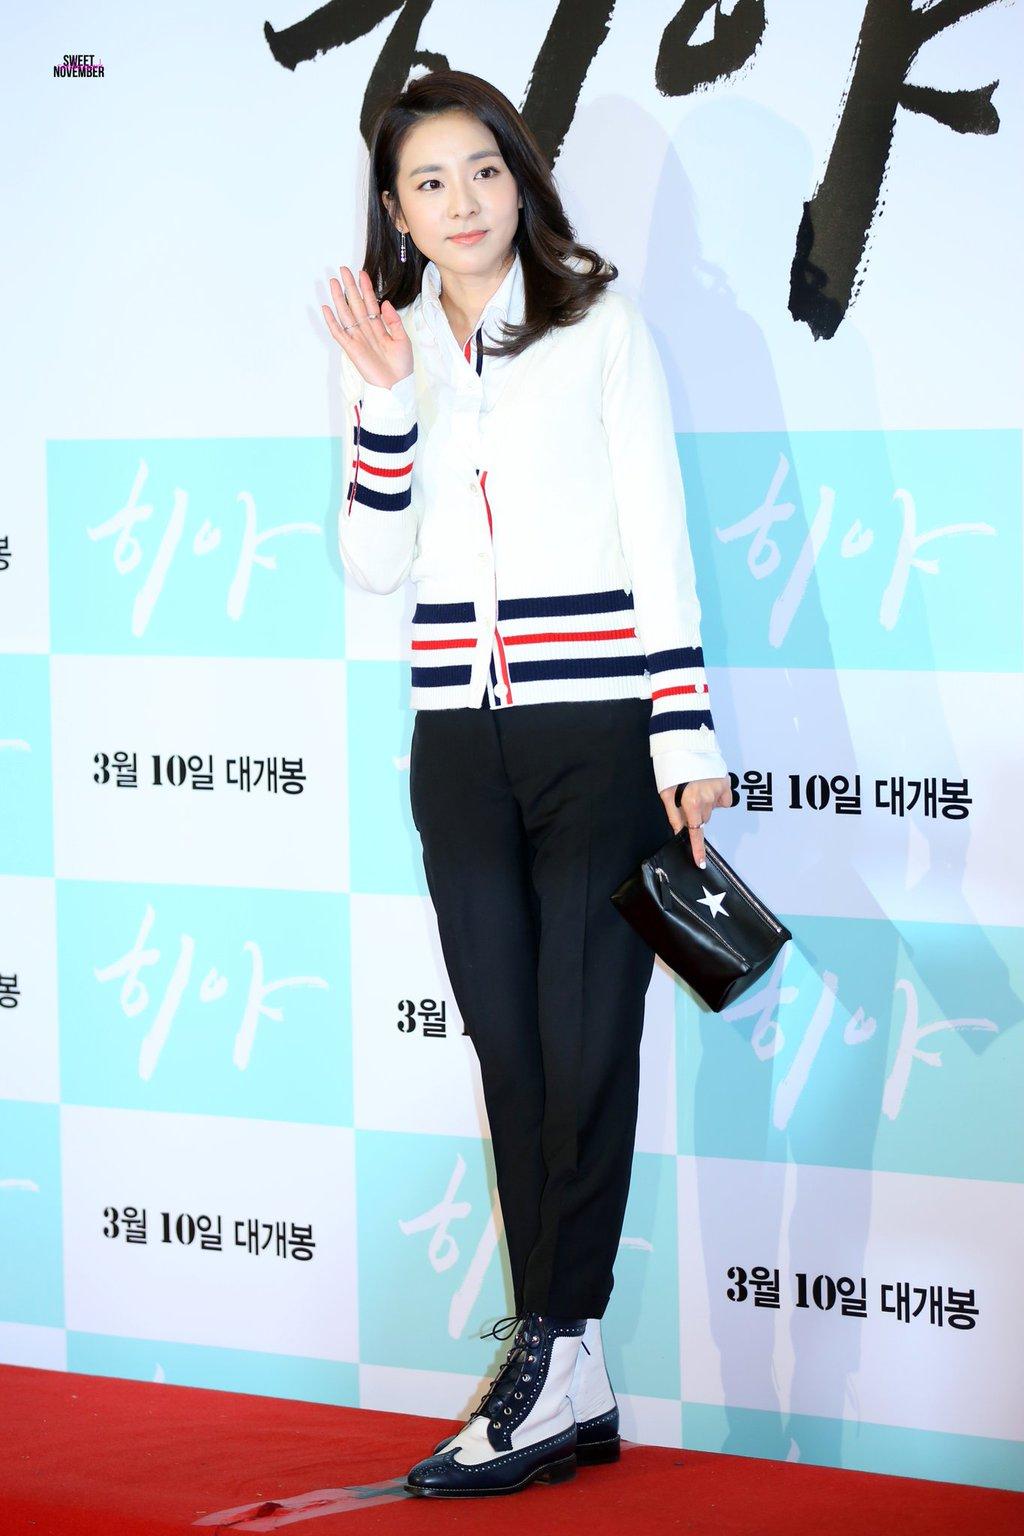 [SN PHOTOS] 160308 – HQ Fantaken of Pretty Dara at 'Heeya' VIP Movie Premiere